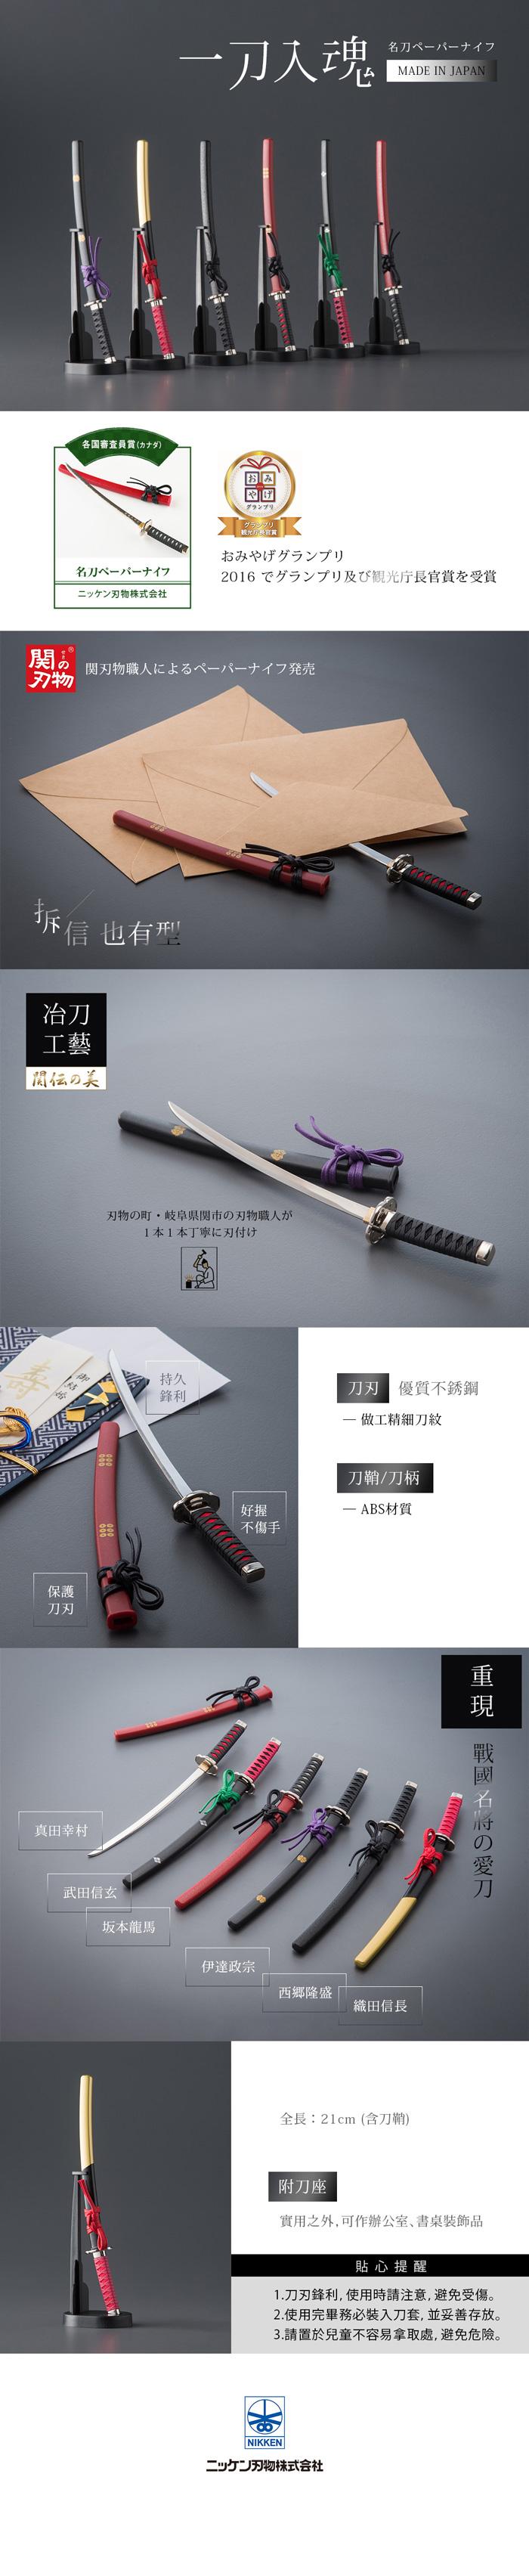 nikken-cutlery|復刻名將 武士魂拆信刀 (織田信長)